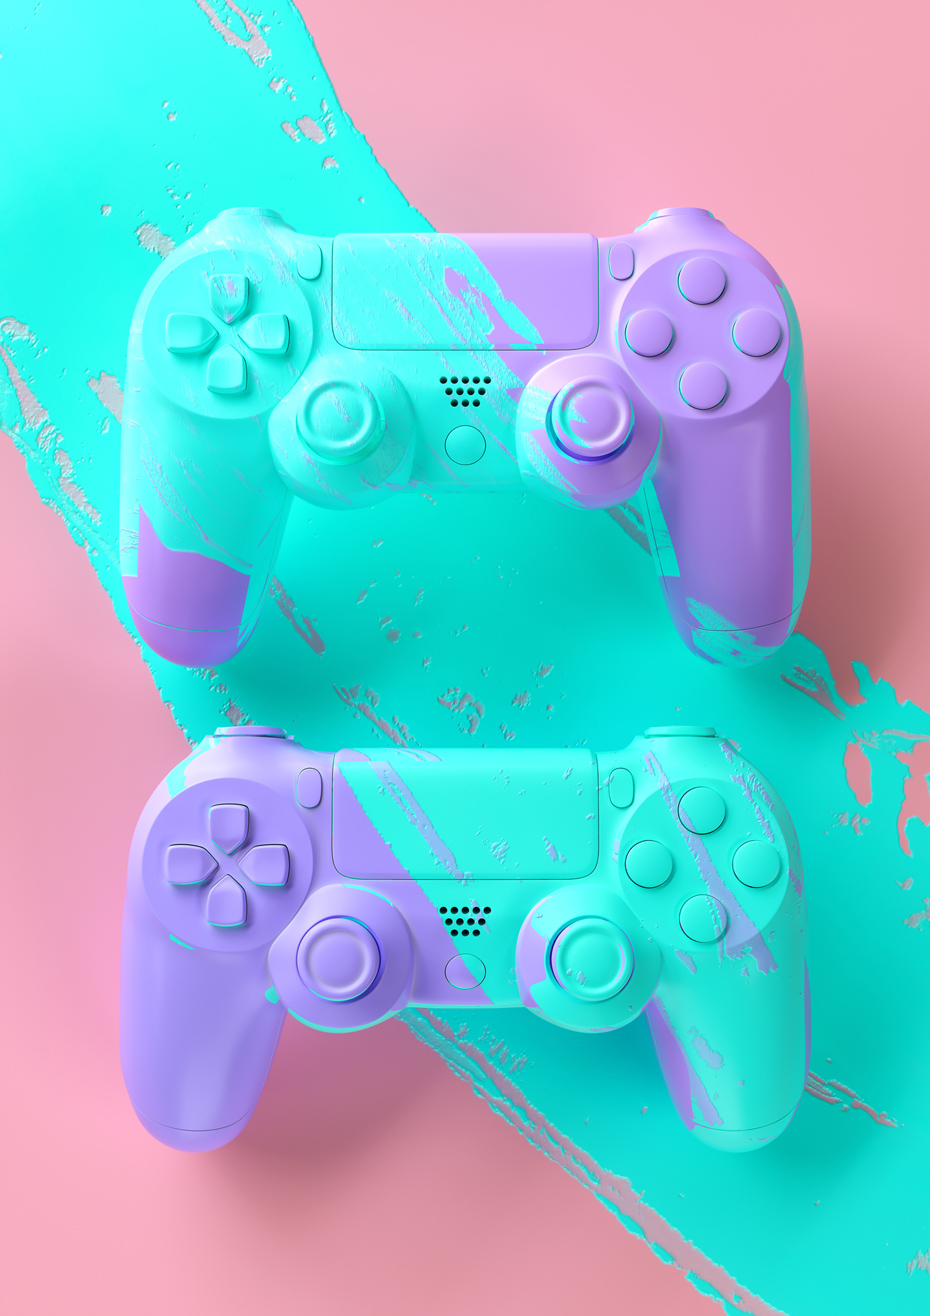 PaintedObjectArt_PS4Control.jpg